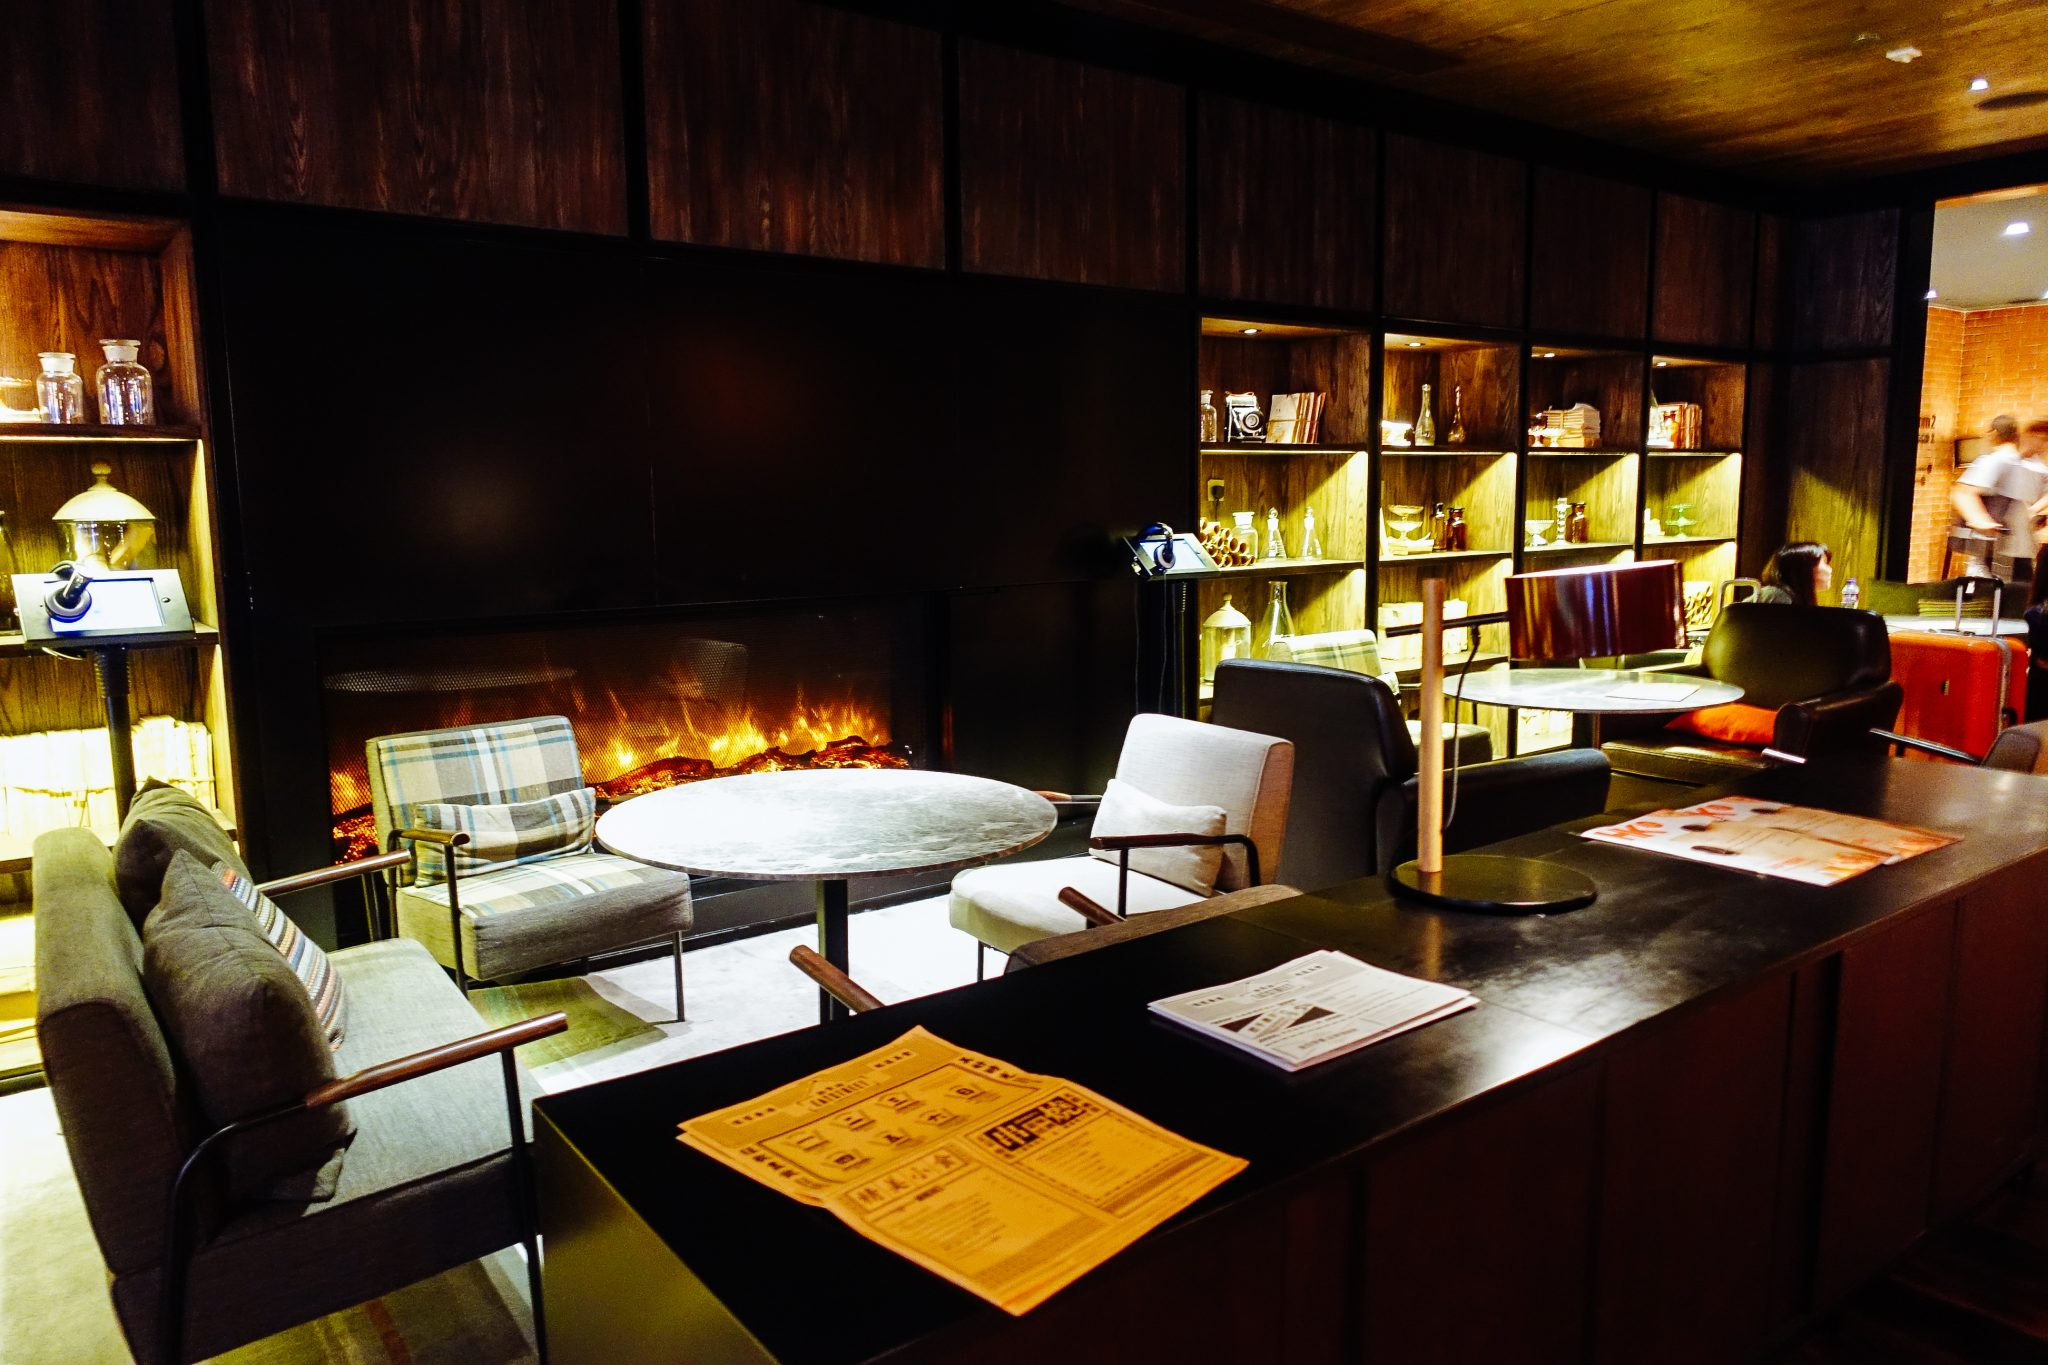 penta hotel kowloon hong kong karla around the world